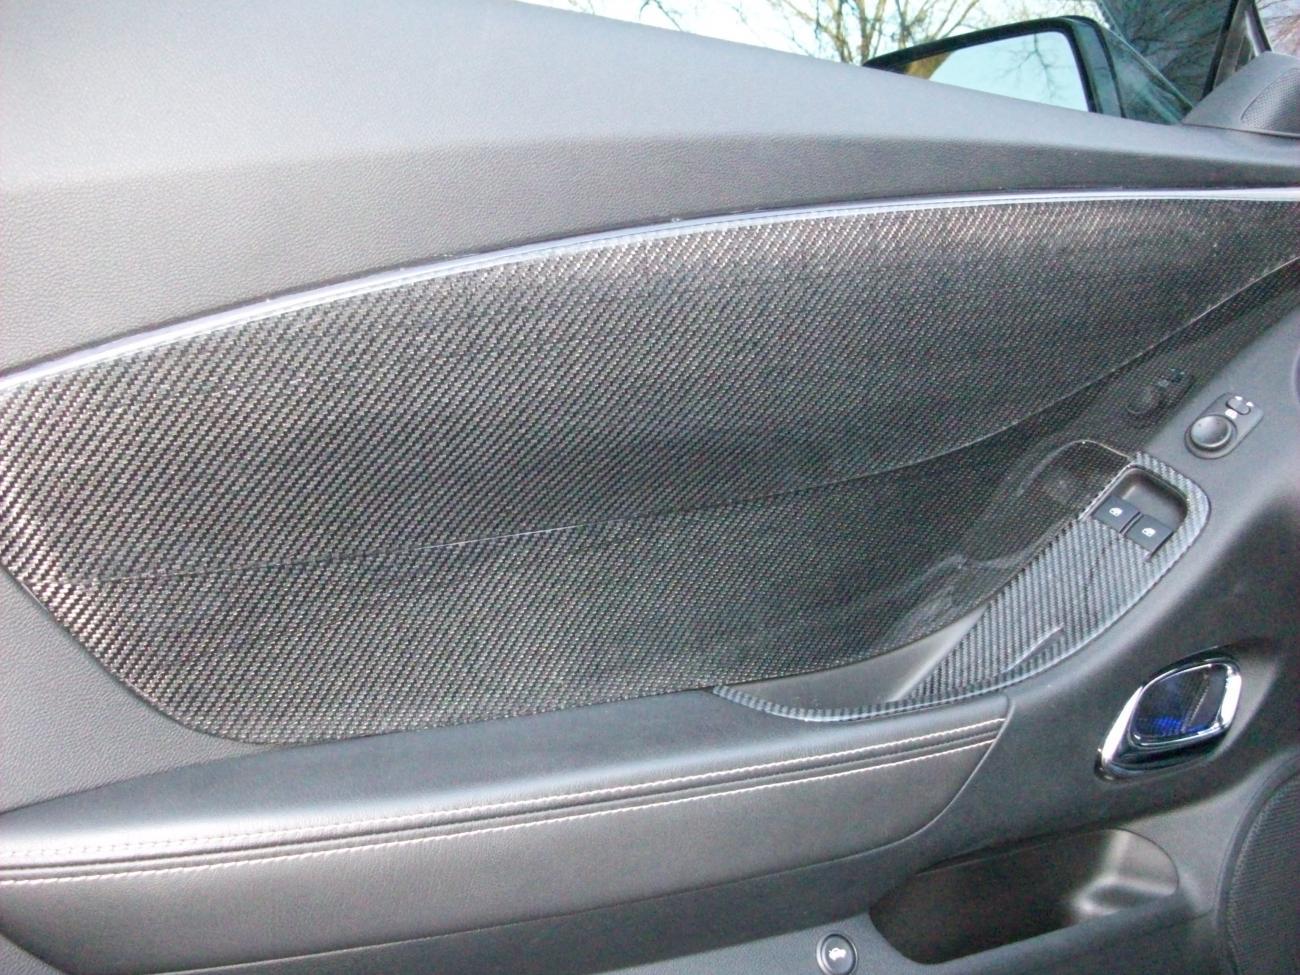 Carid Carbon Fiber Interior Trim Kit Page 8 Camaro5 Chevy Camaro Forum Camaro Zl1 Ss And